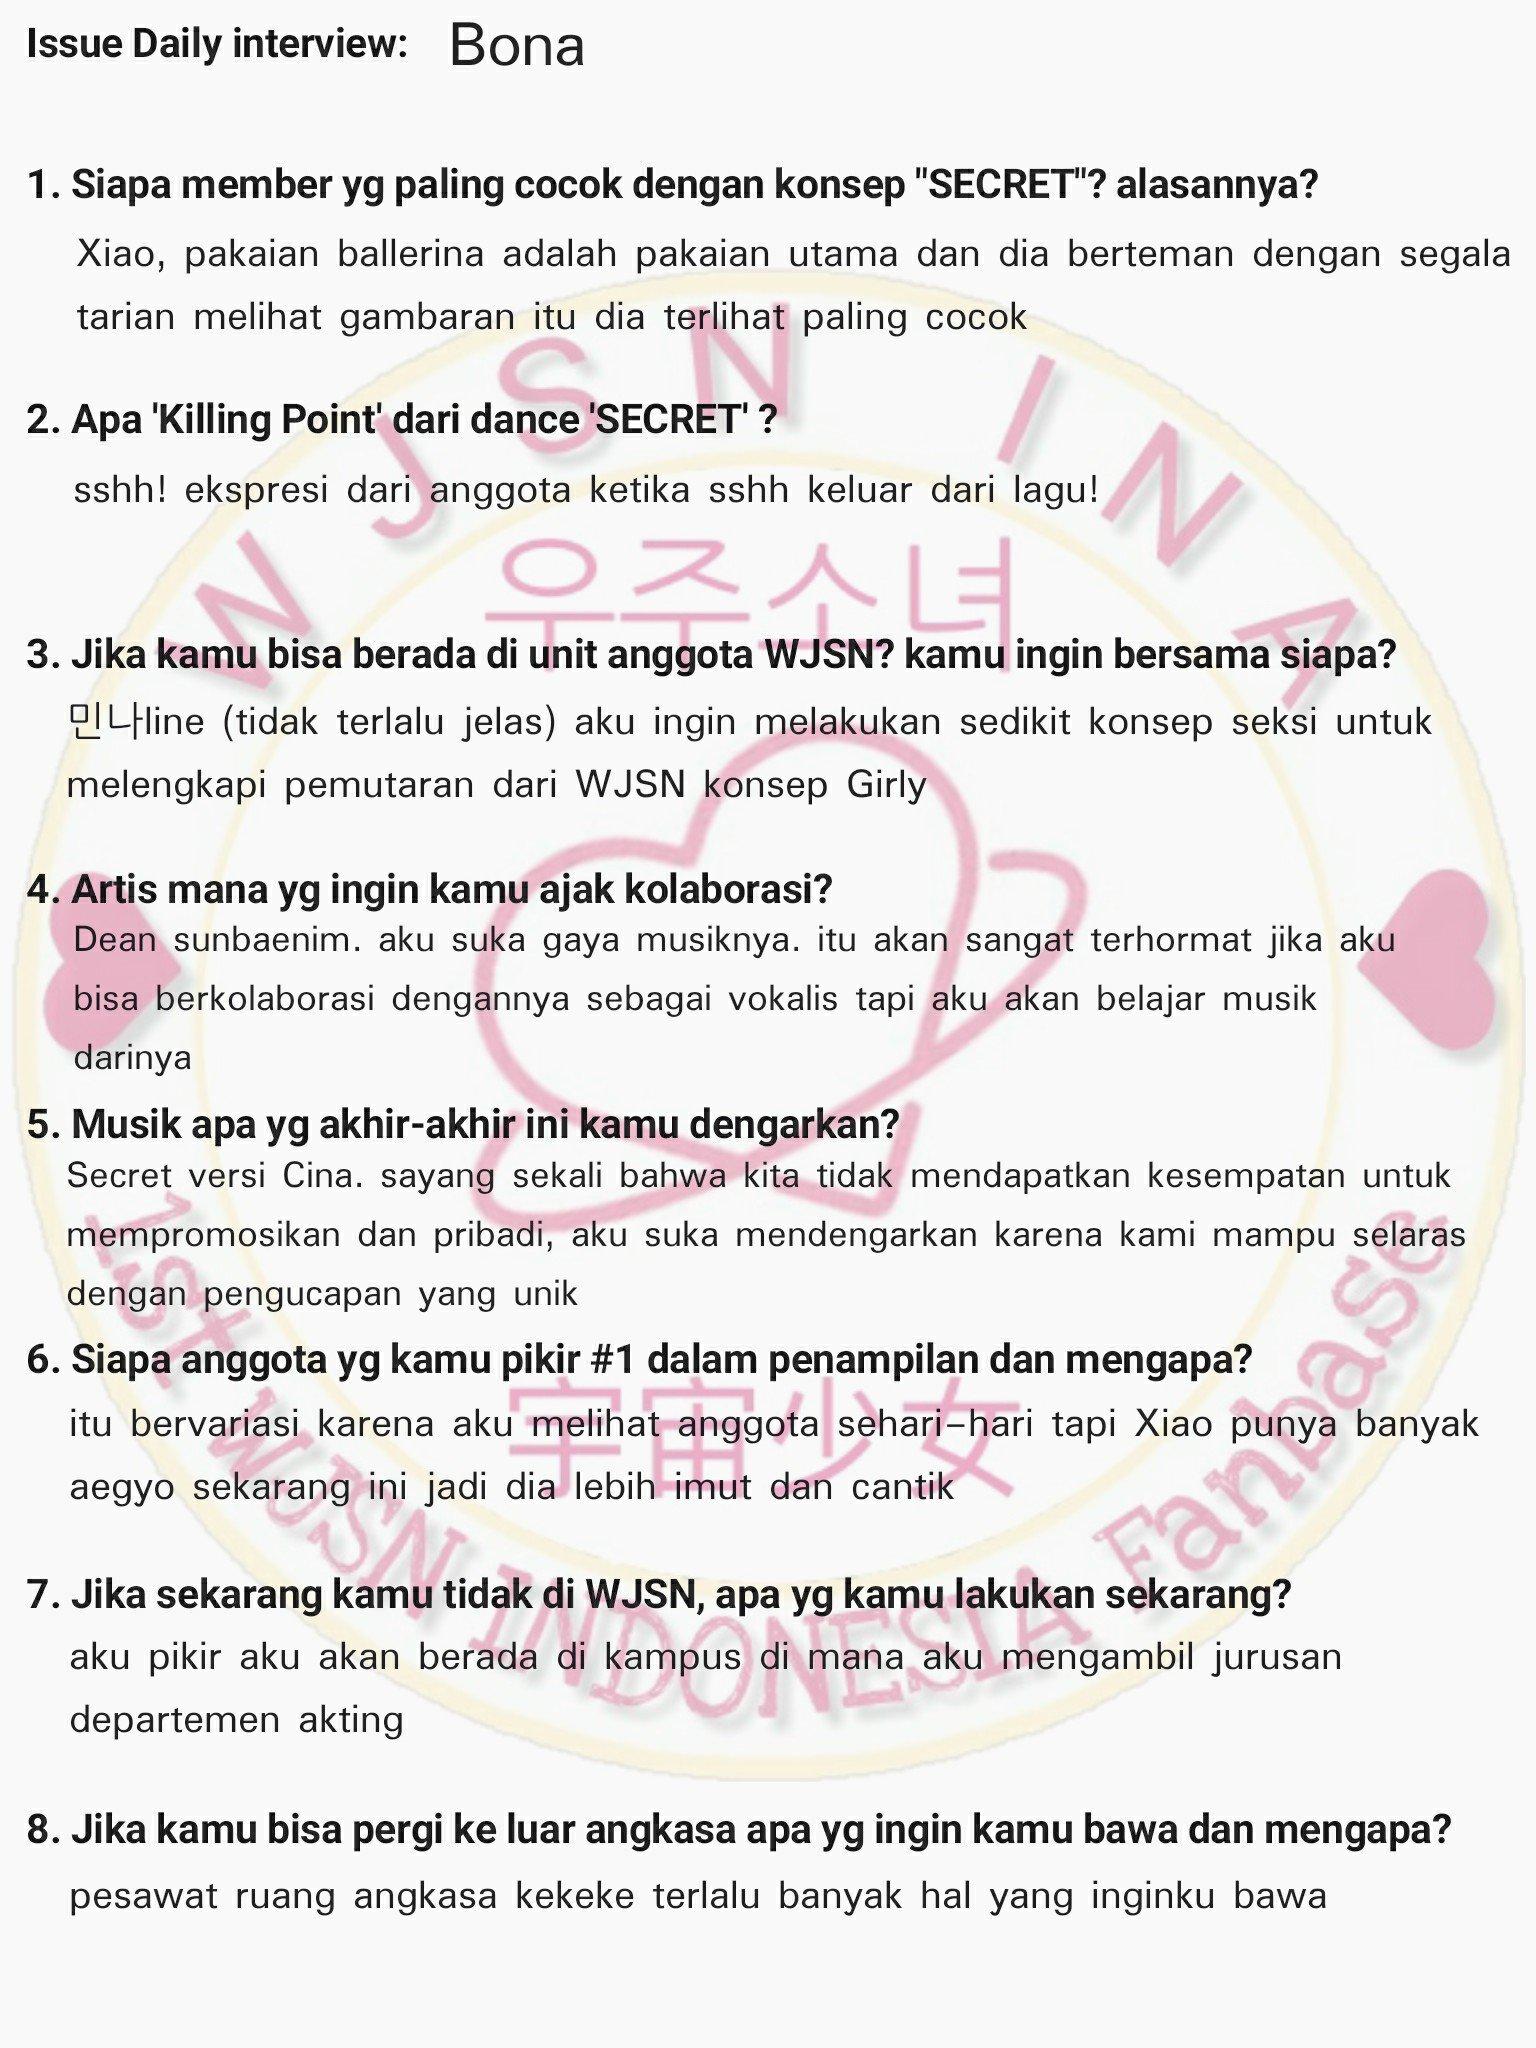 Wjsn Indonesia On Trans  Ec A B Ec A Bc Ec  C Eb    Eb B B Eb    Ec   Ec B C Wjsn Bona Exy Handwritten Interview For Issue Daily Https T Co Brezstbz